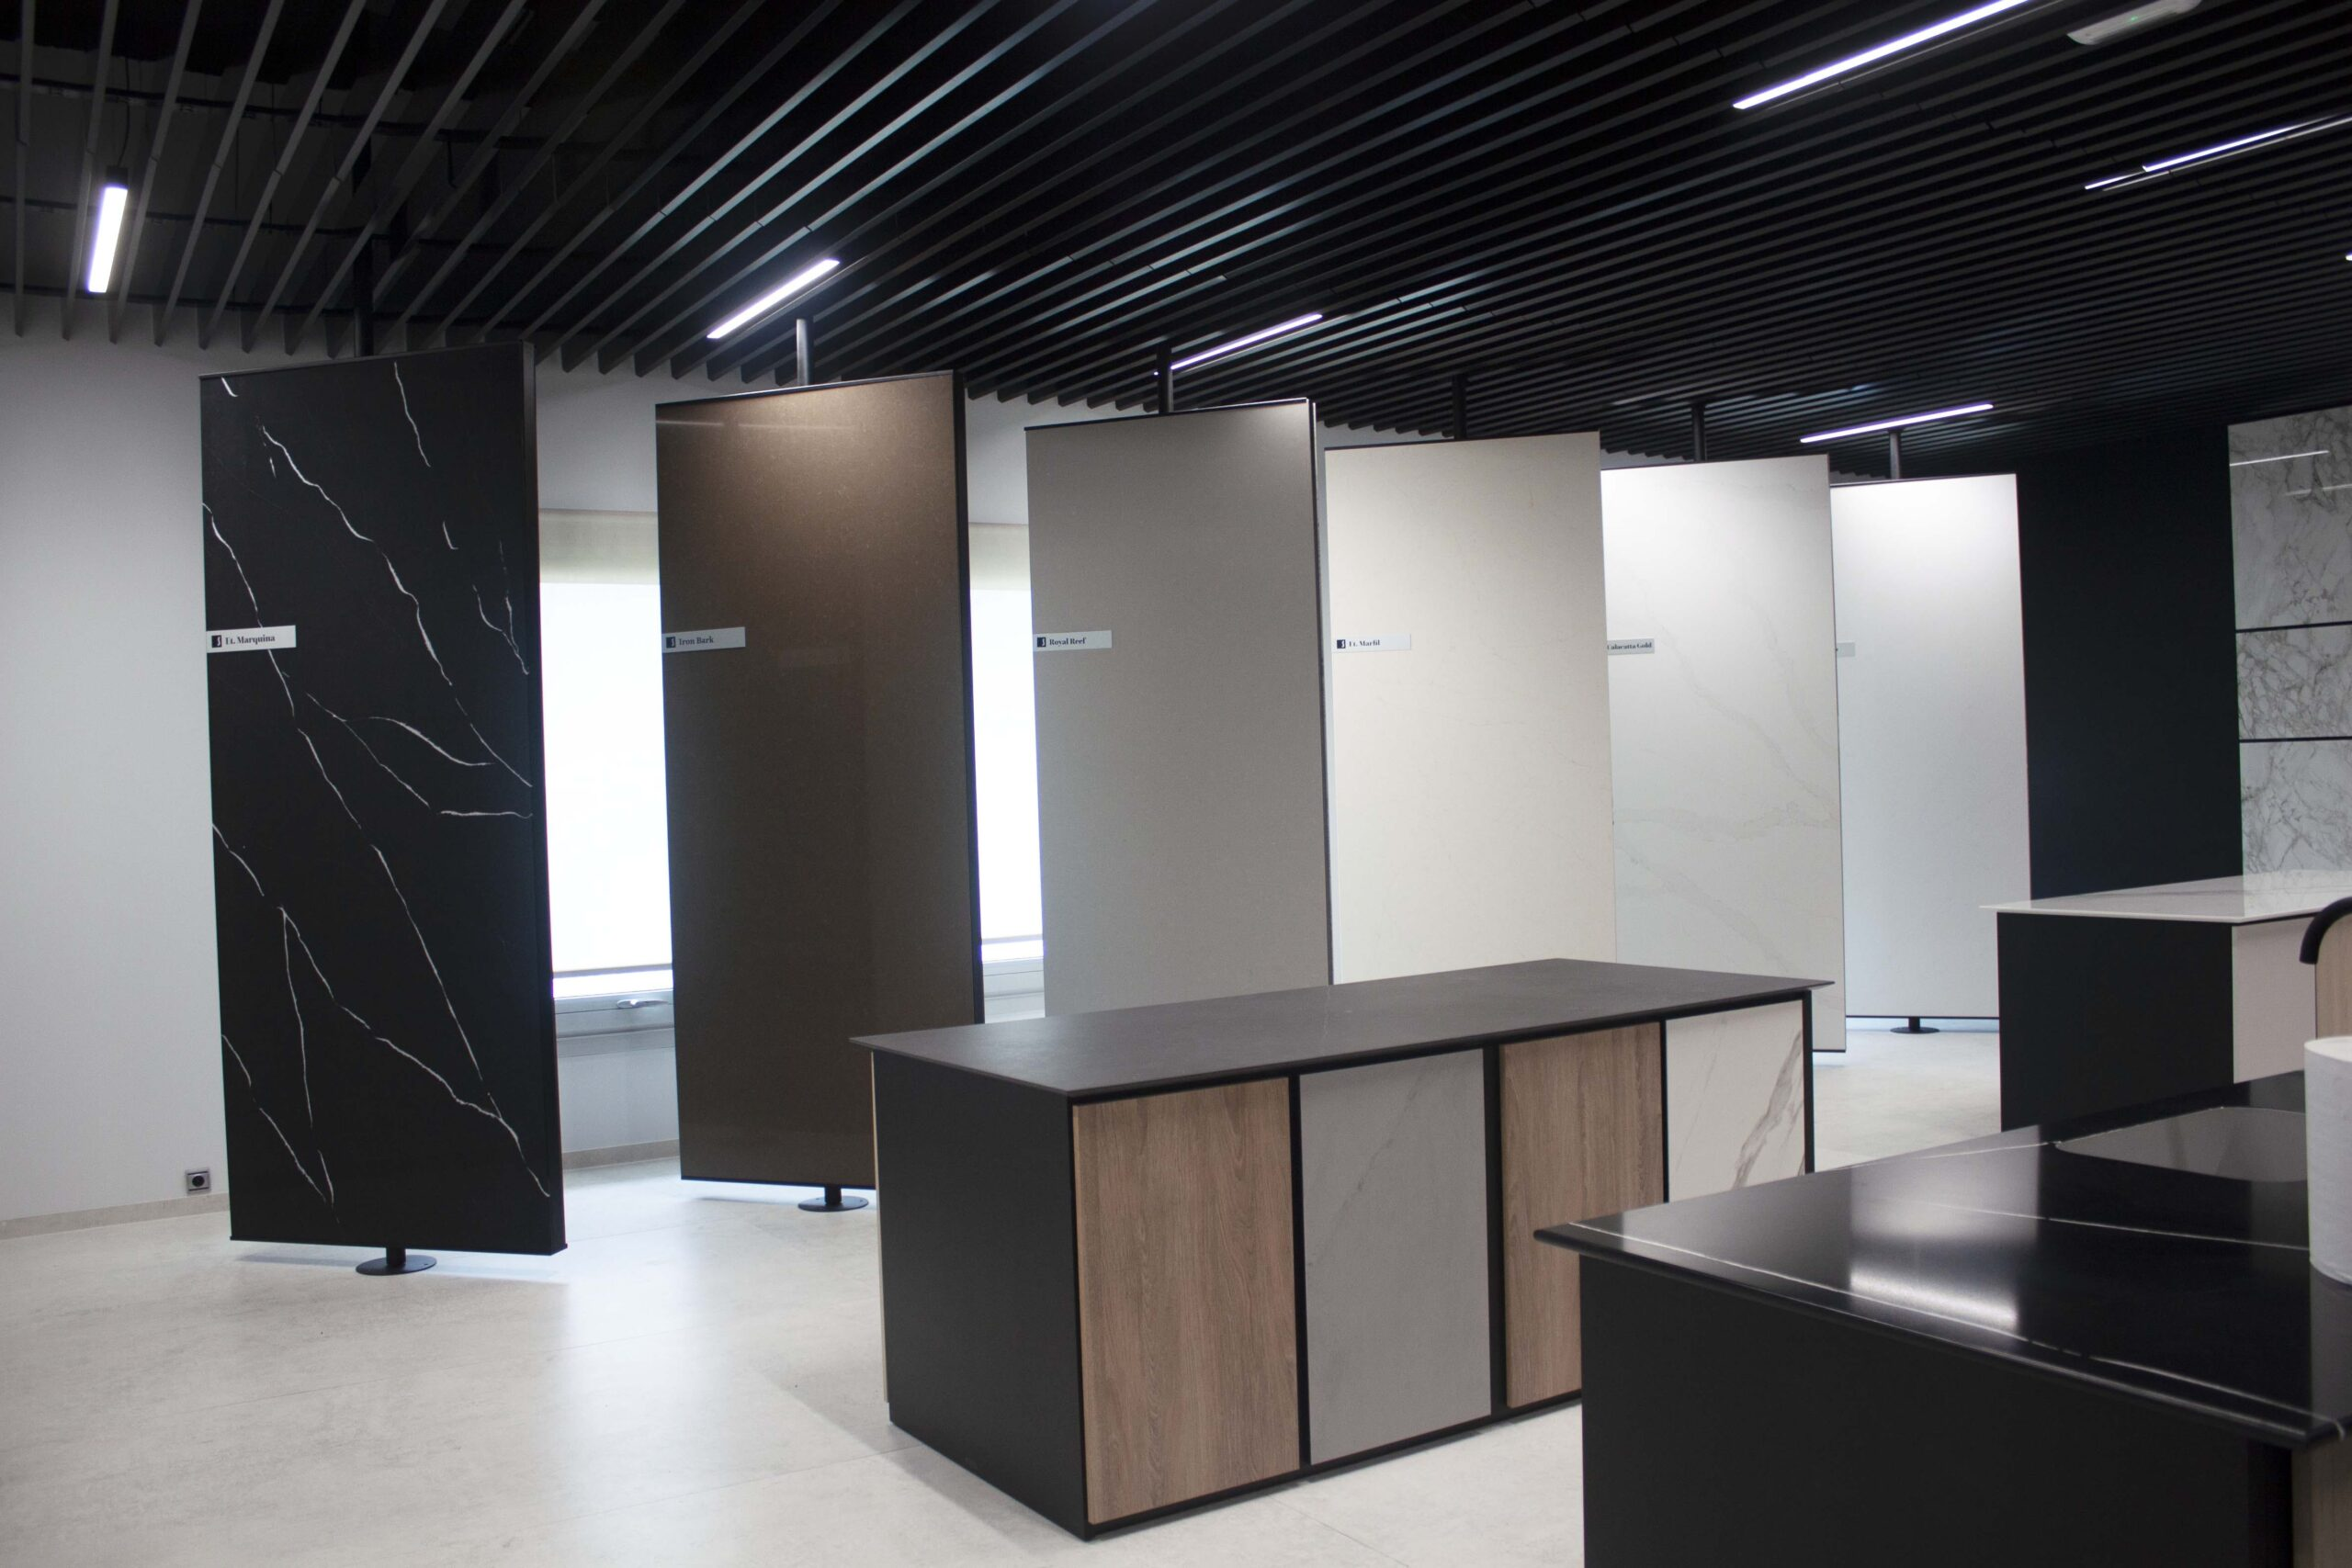 Image of Cosentino Vigo Center Showroom 1 scaled in Cosentino Center Vigo undertakes a beautiful renovation - Cosentino